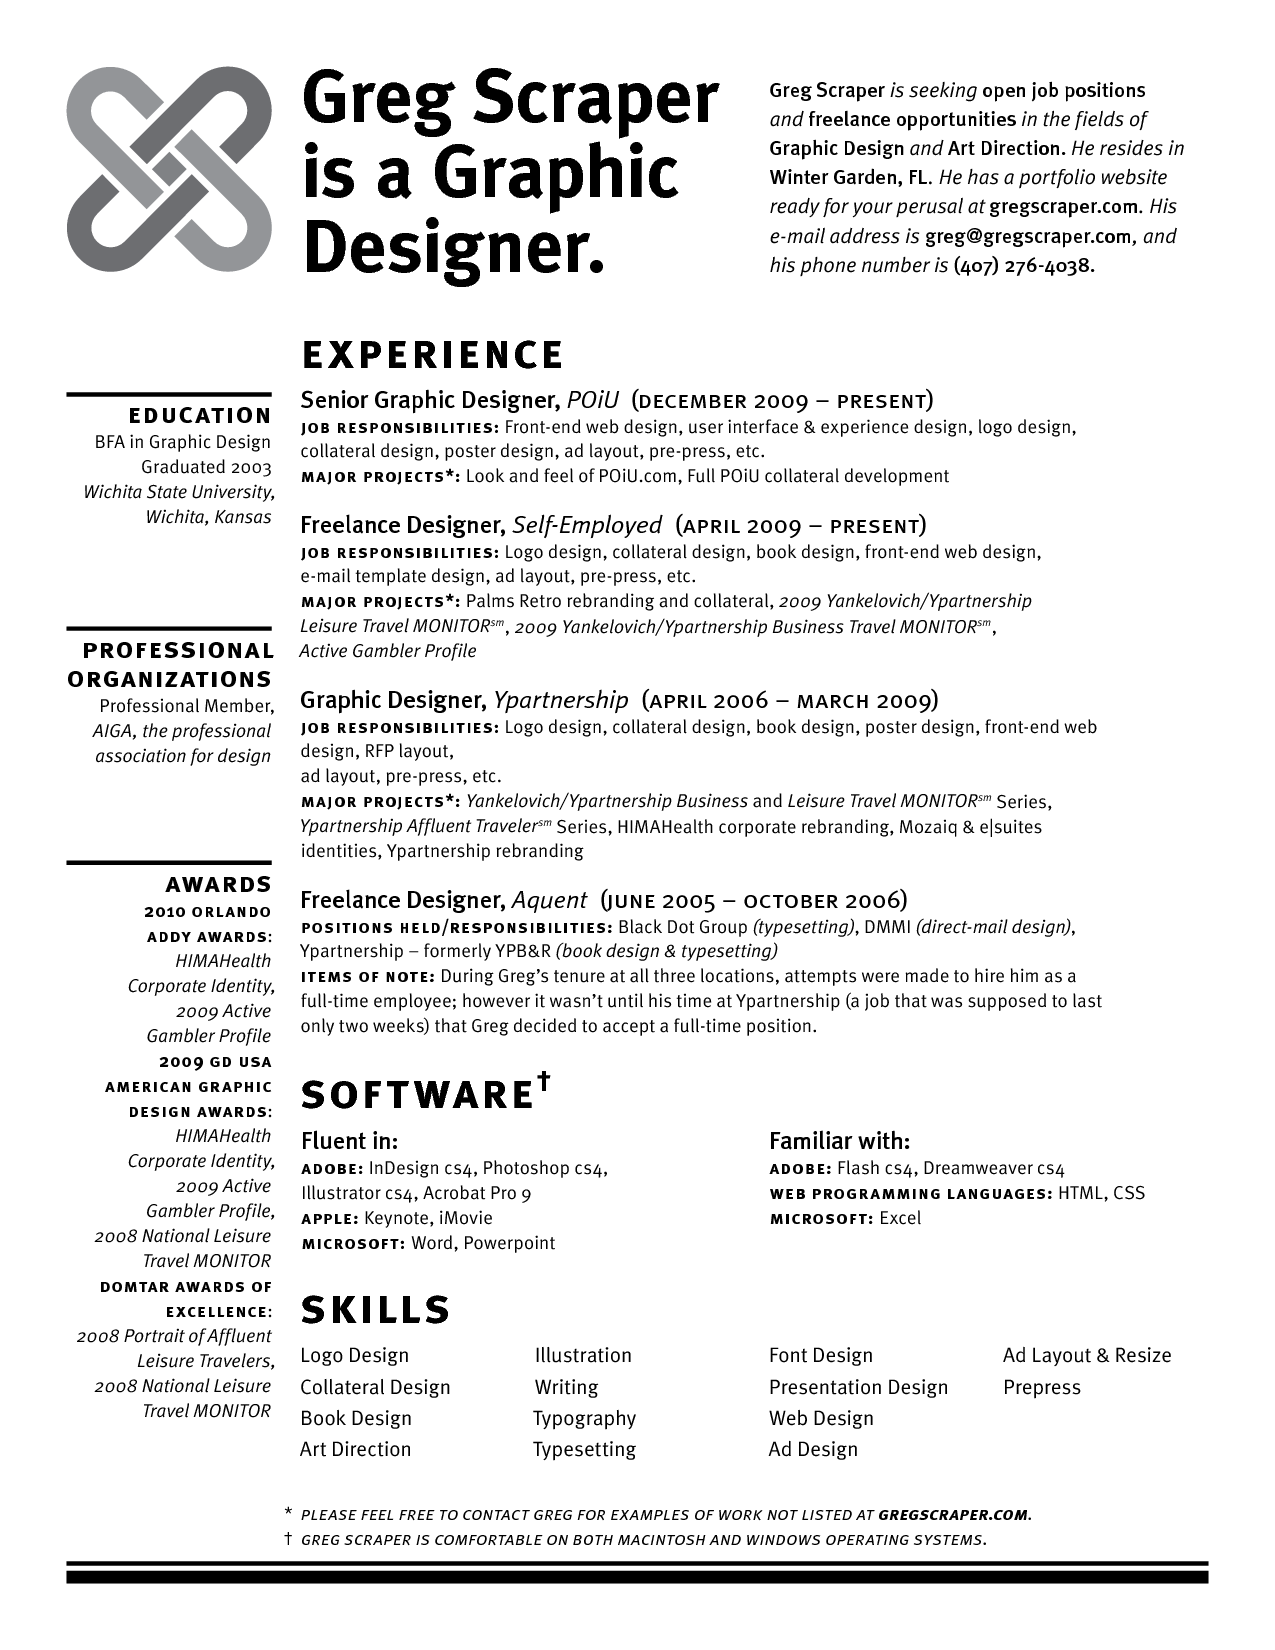 Self Employed Resume Templatecareer Resume Template Career Resume Template Resume Templates Resume Template Resume